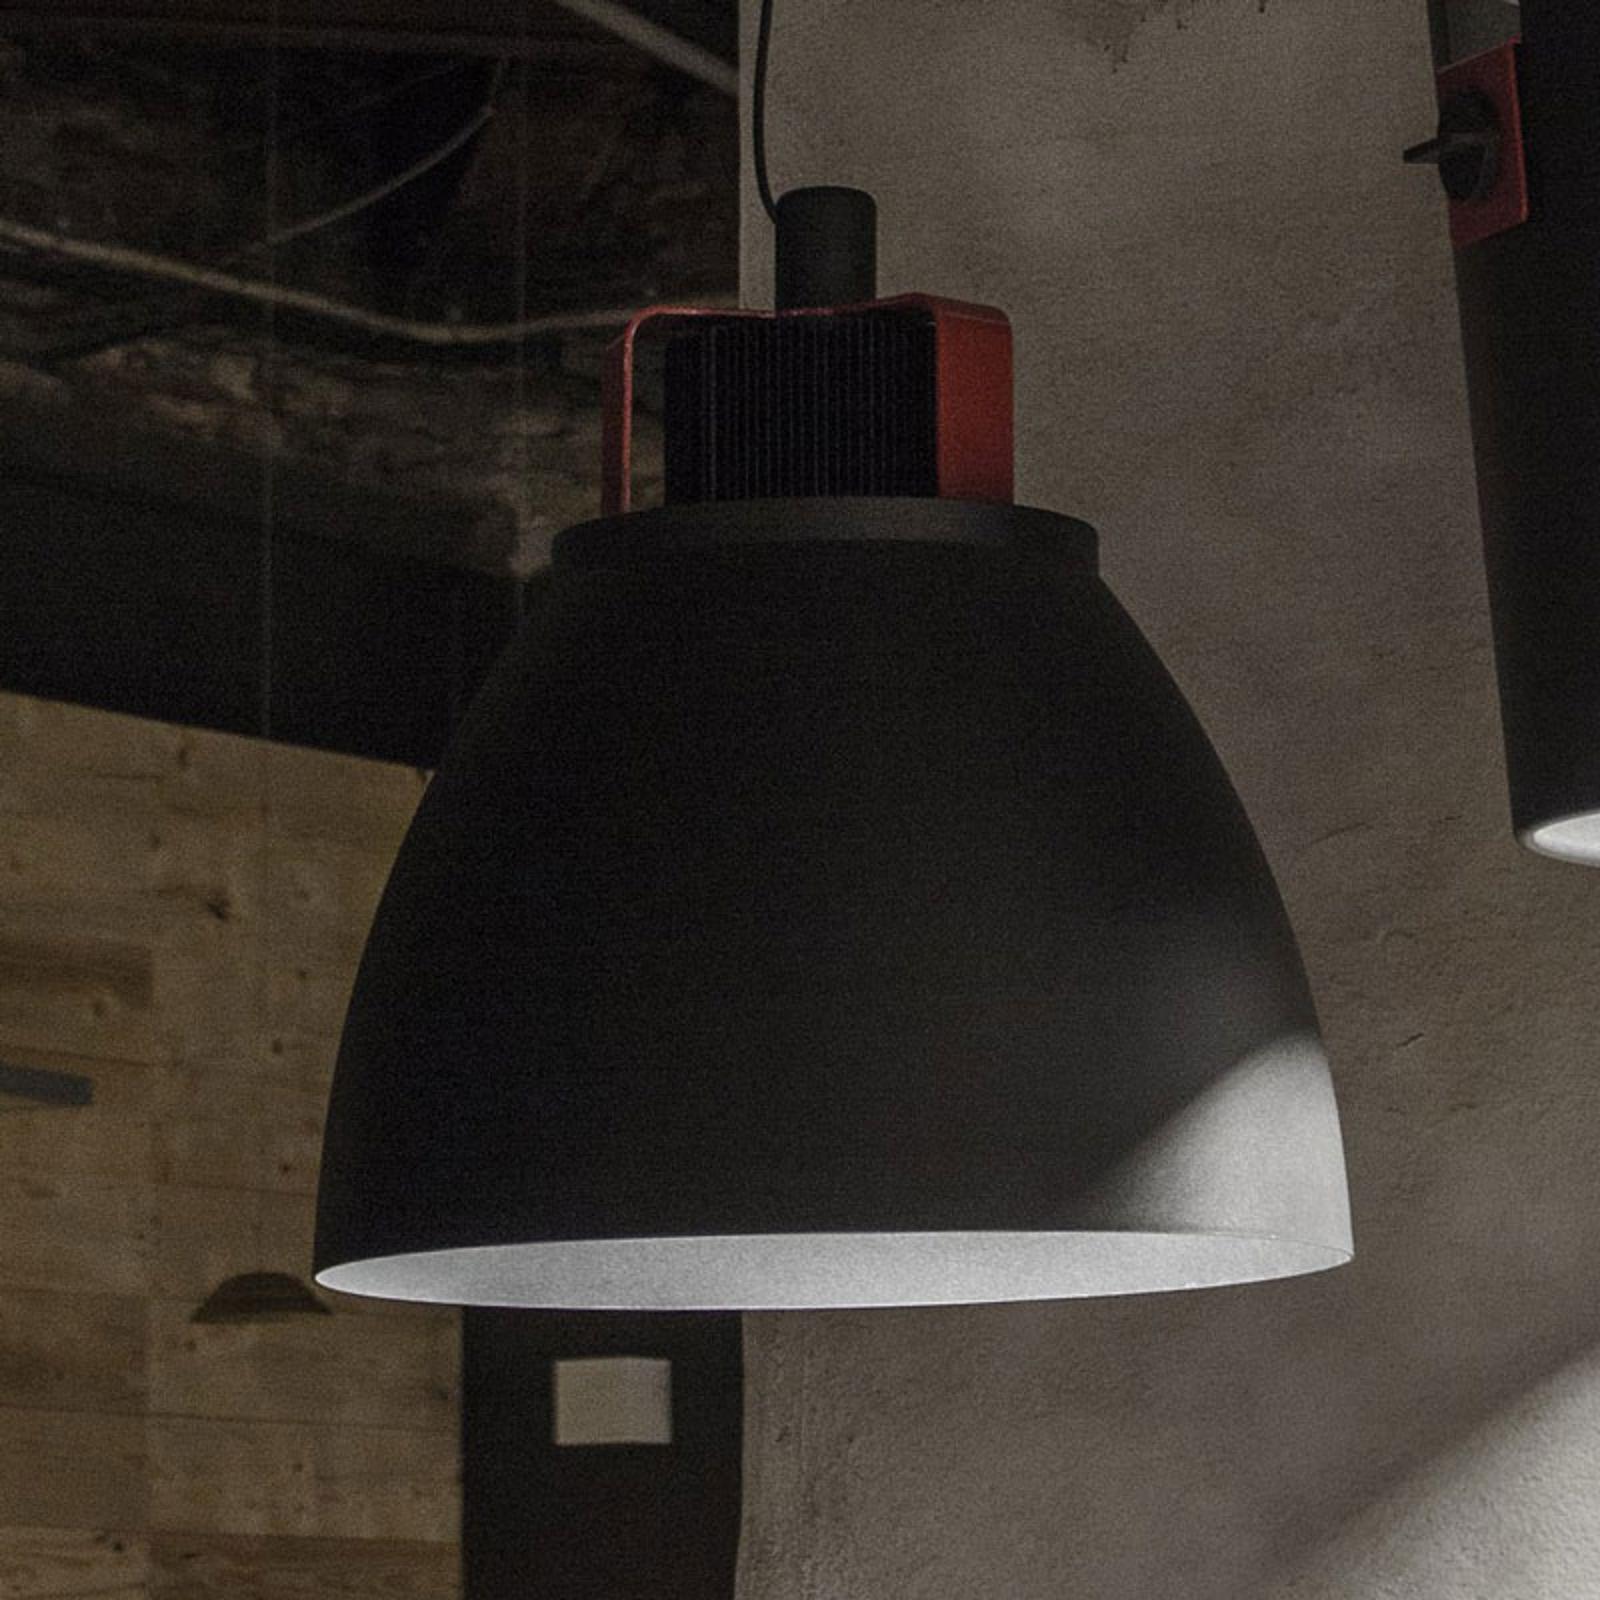 Martinelli Luce Condor LED-Hängeleuchte, Ø 50 cm